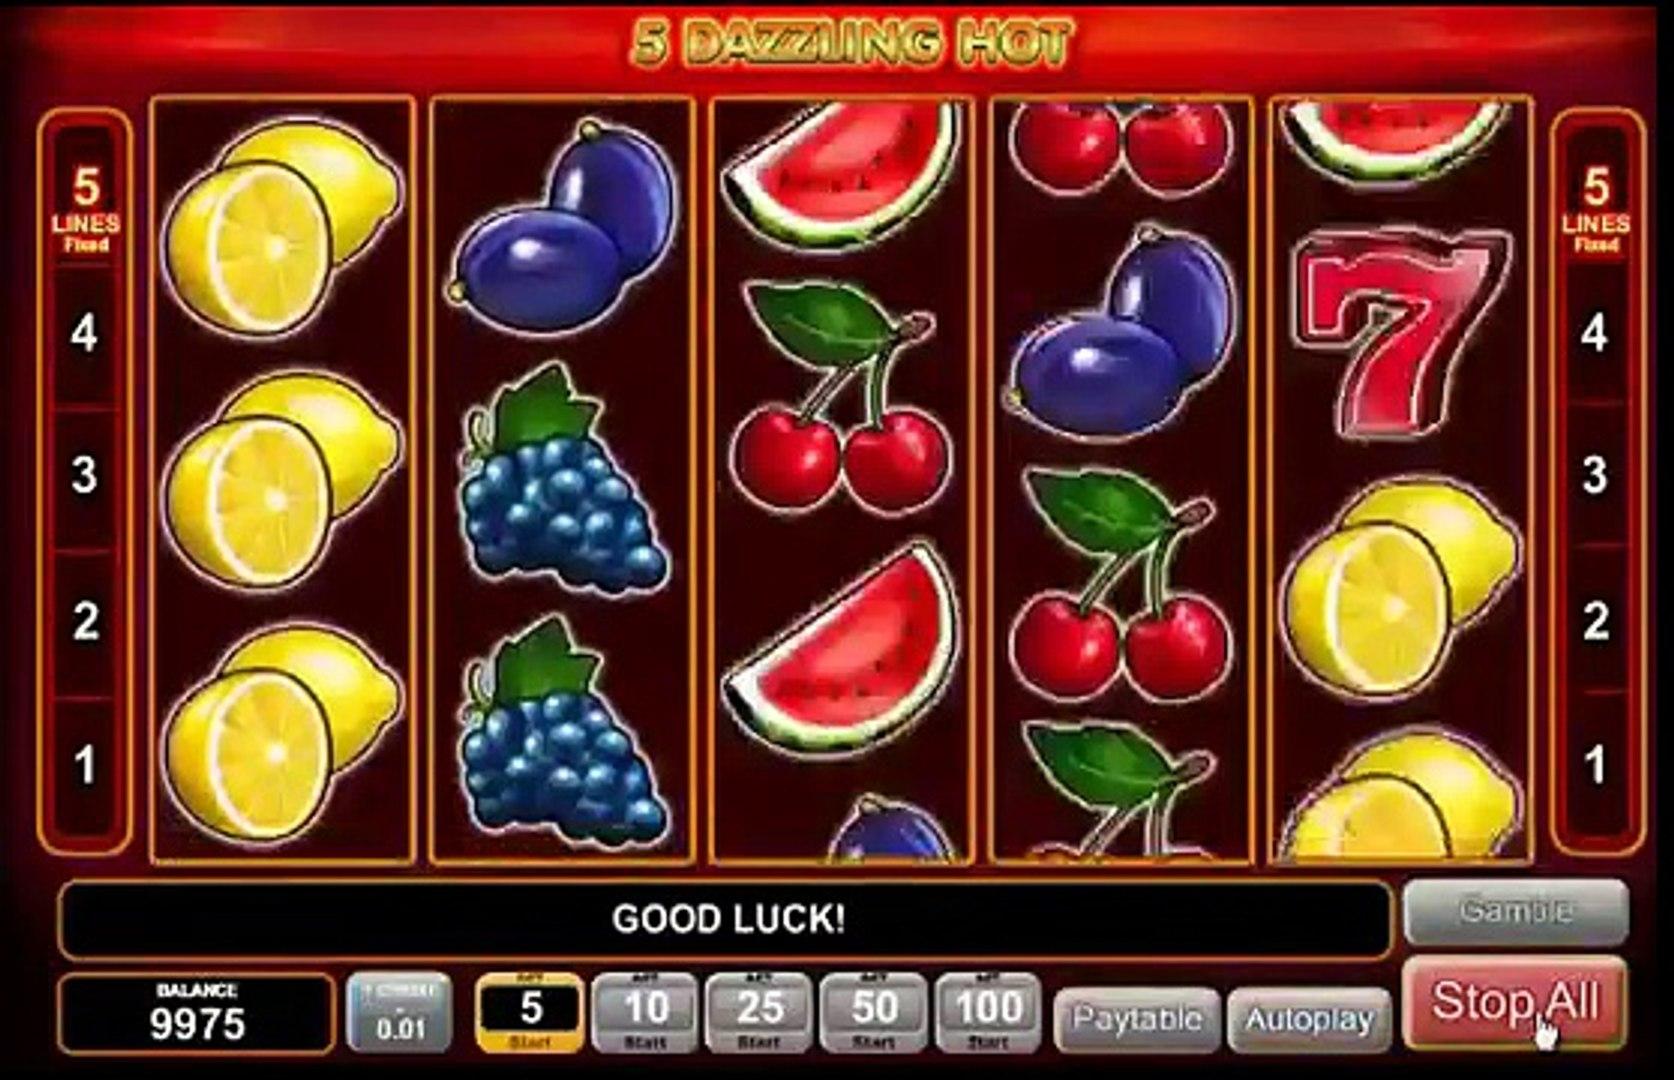 New 5 Dazzling Hot Slot Machine Online 77777 Free Game Video